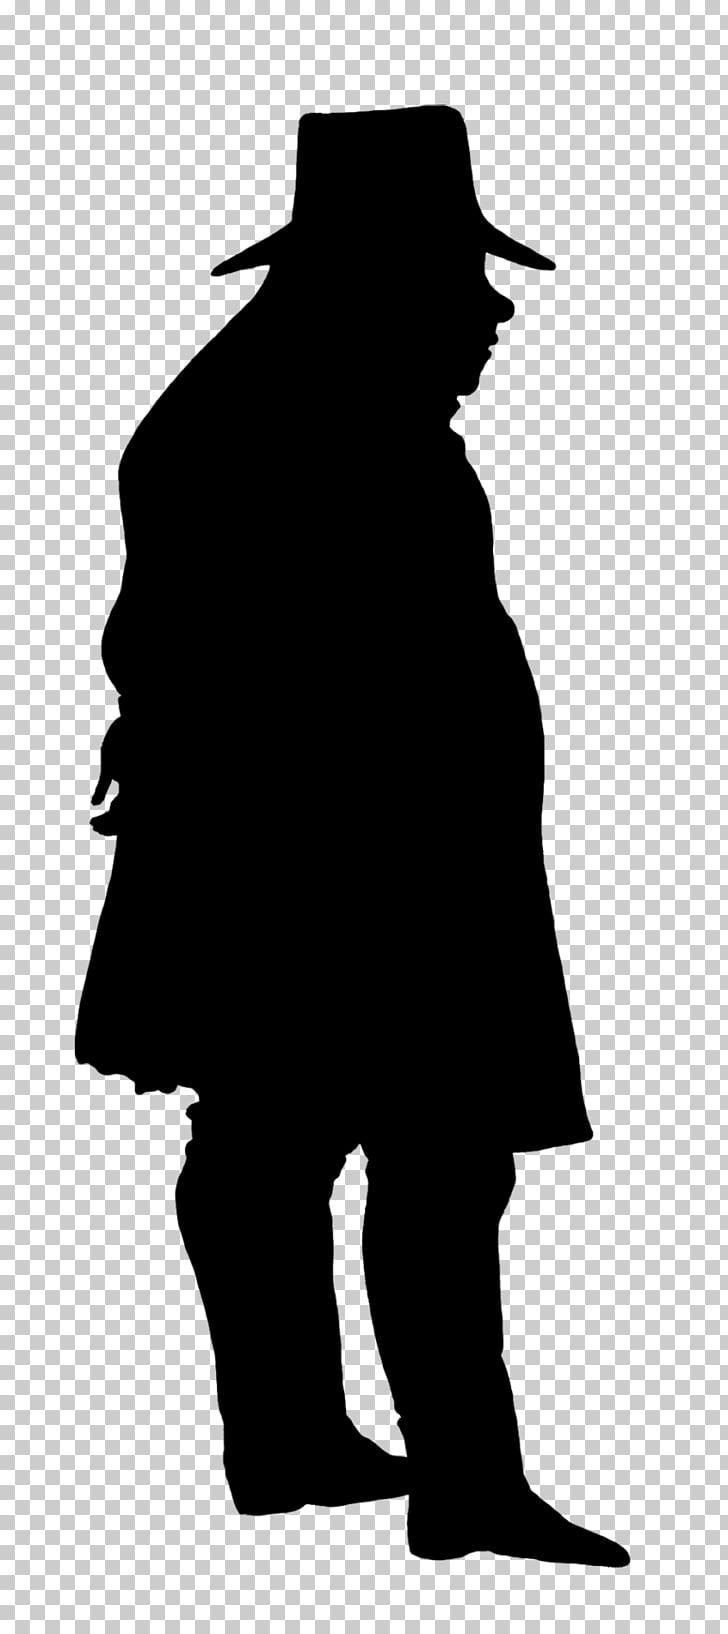 medium resolution of victorian era silhouette gentleman man silhouette png clipart